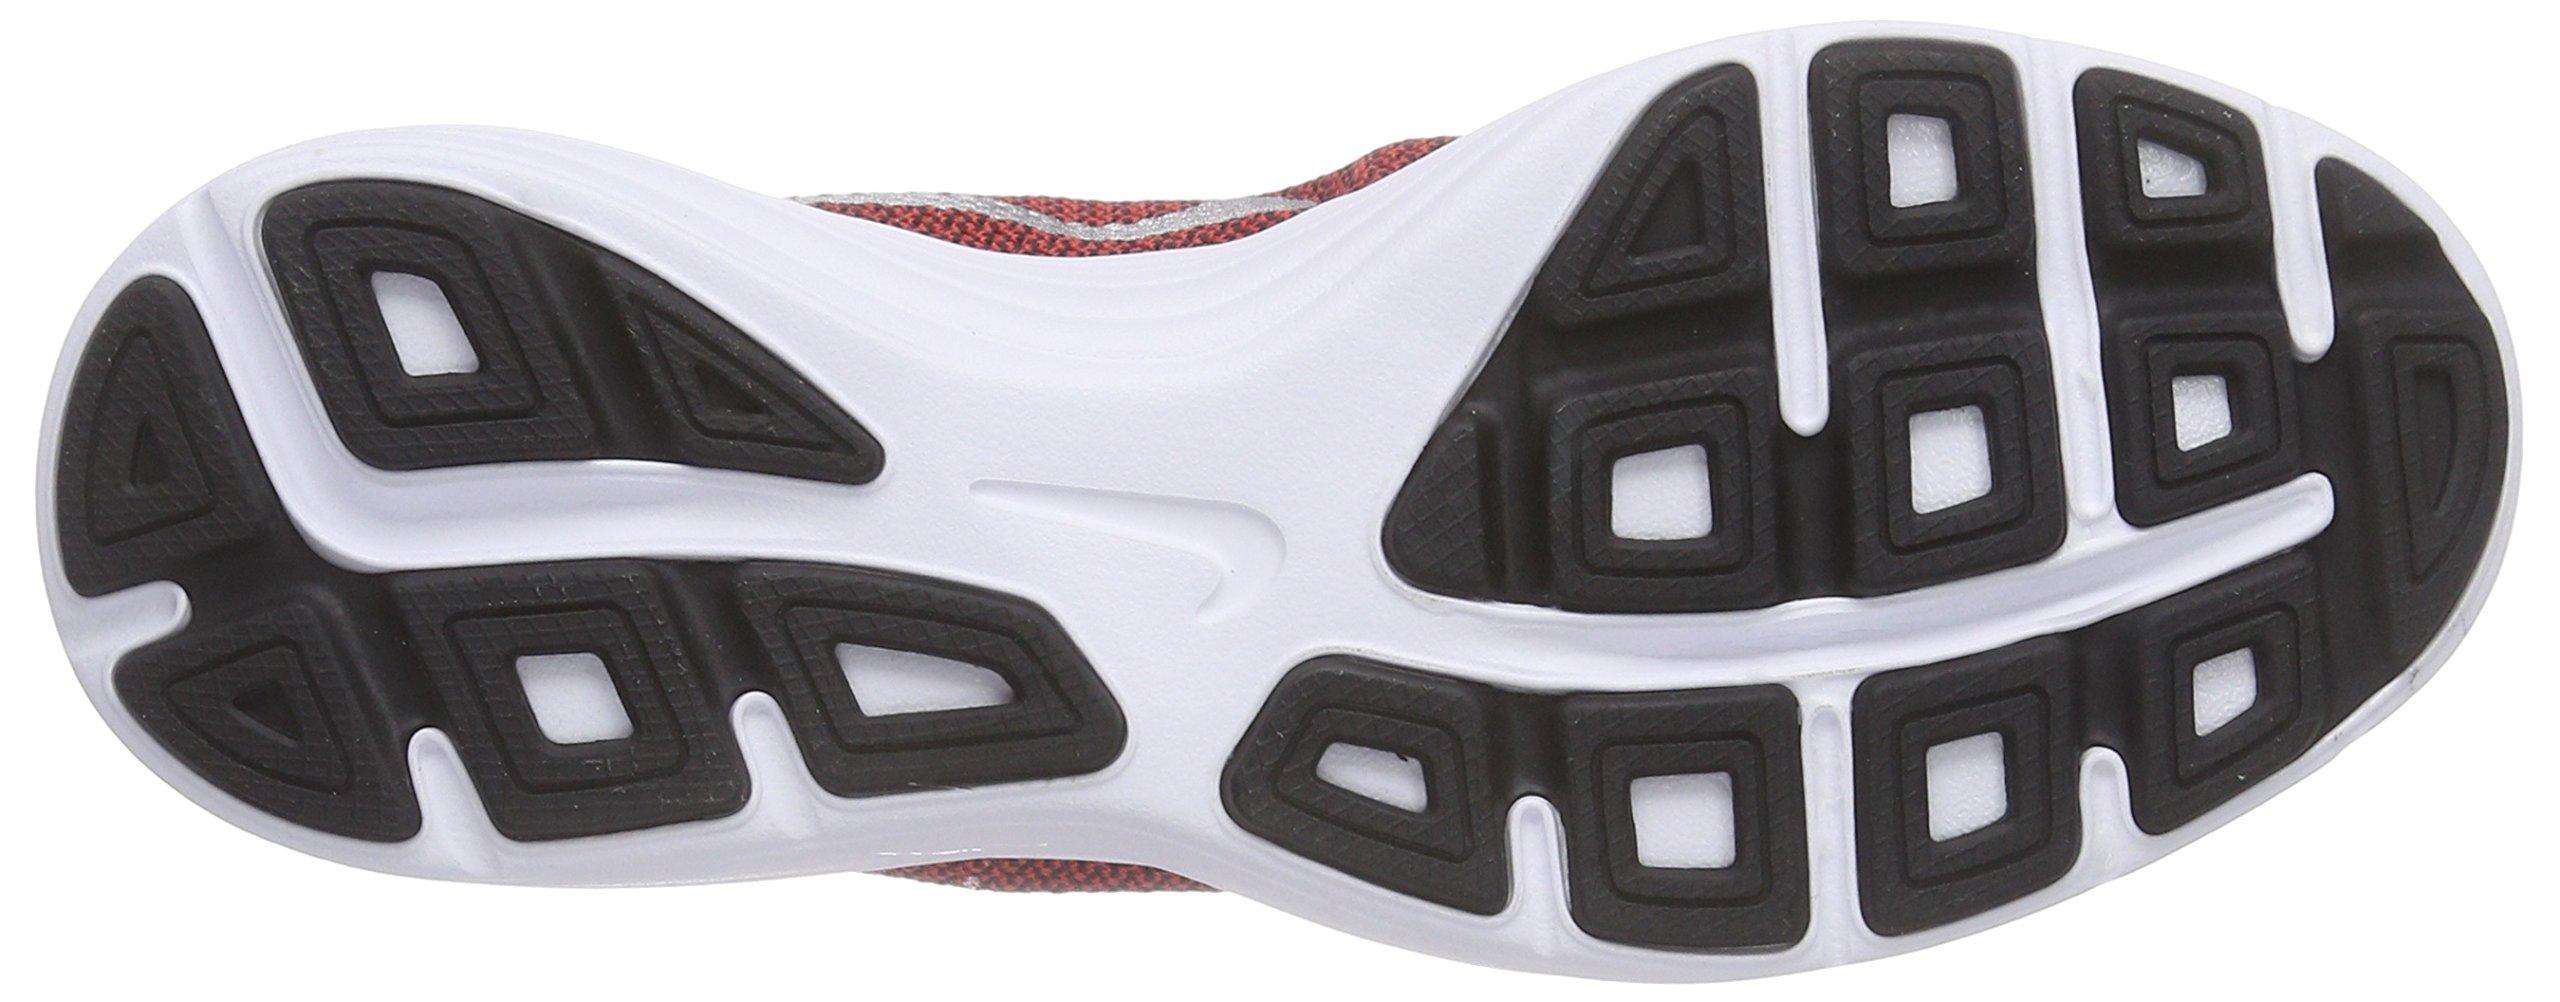 NIKE Boys' Revolution 3 Running Shoe (GS), University Red/Metallic Silver/Black, 3.5 M US Big Kid by Nike (Image #3)